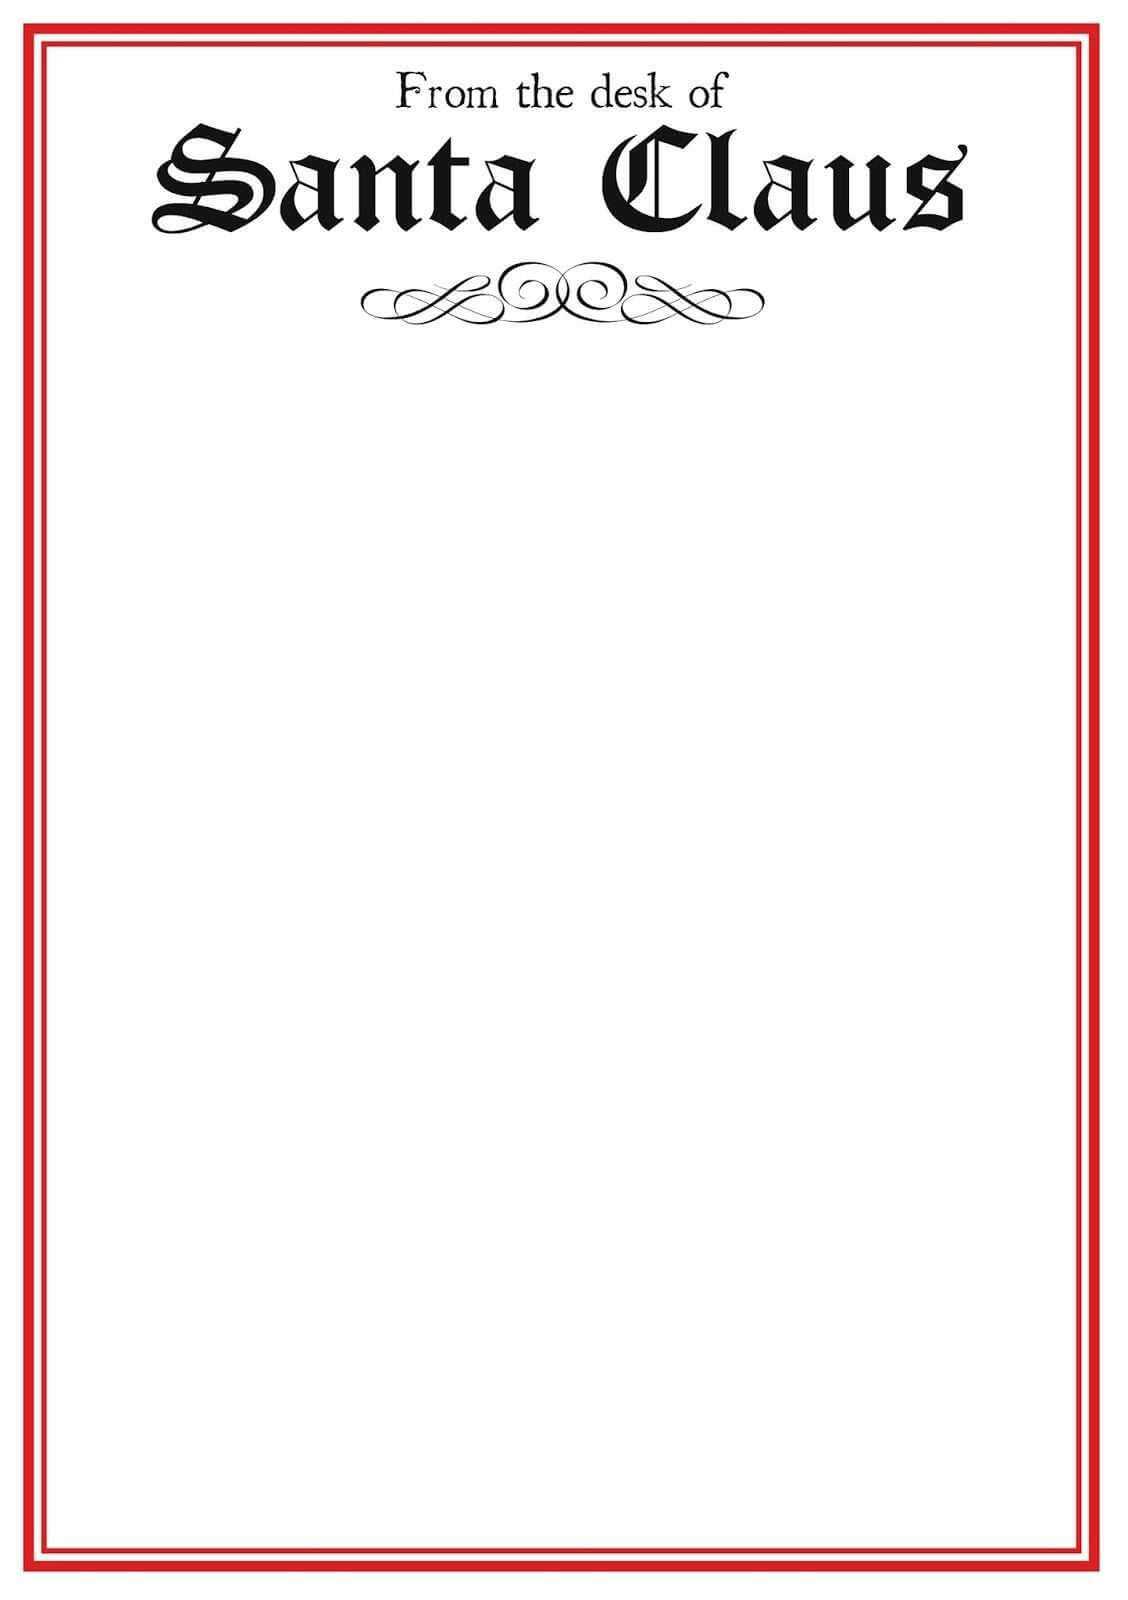 004 Template Ideas Blank Letter From Santa Pdf Cool To With Blank Letter From Santa Template